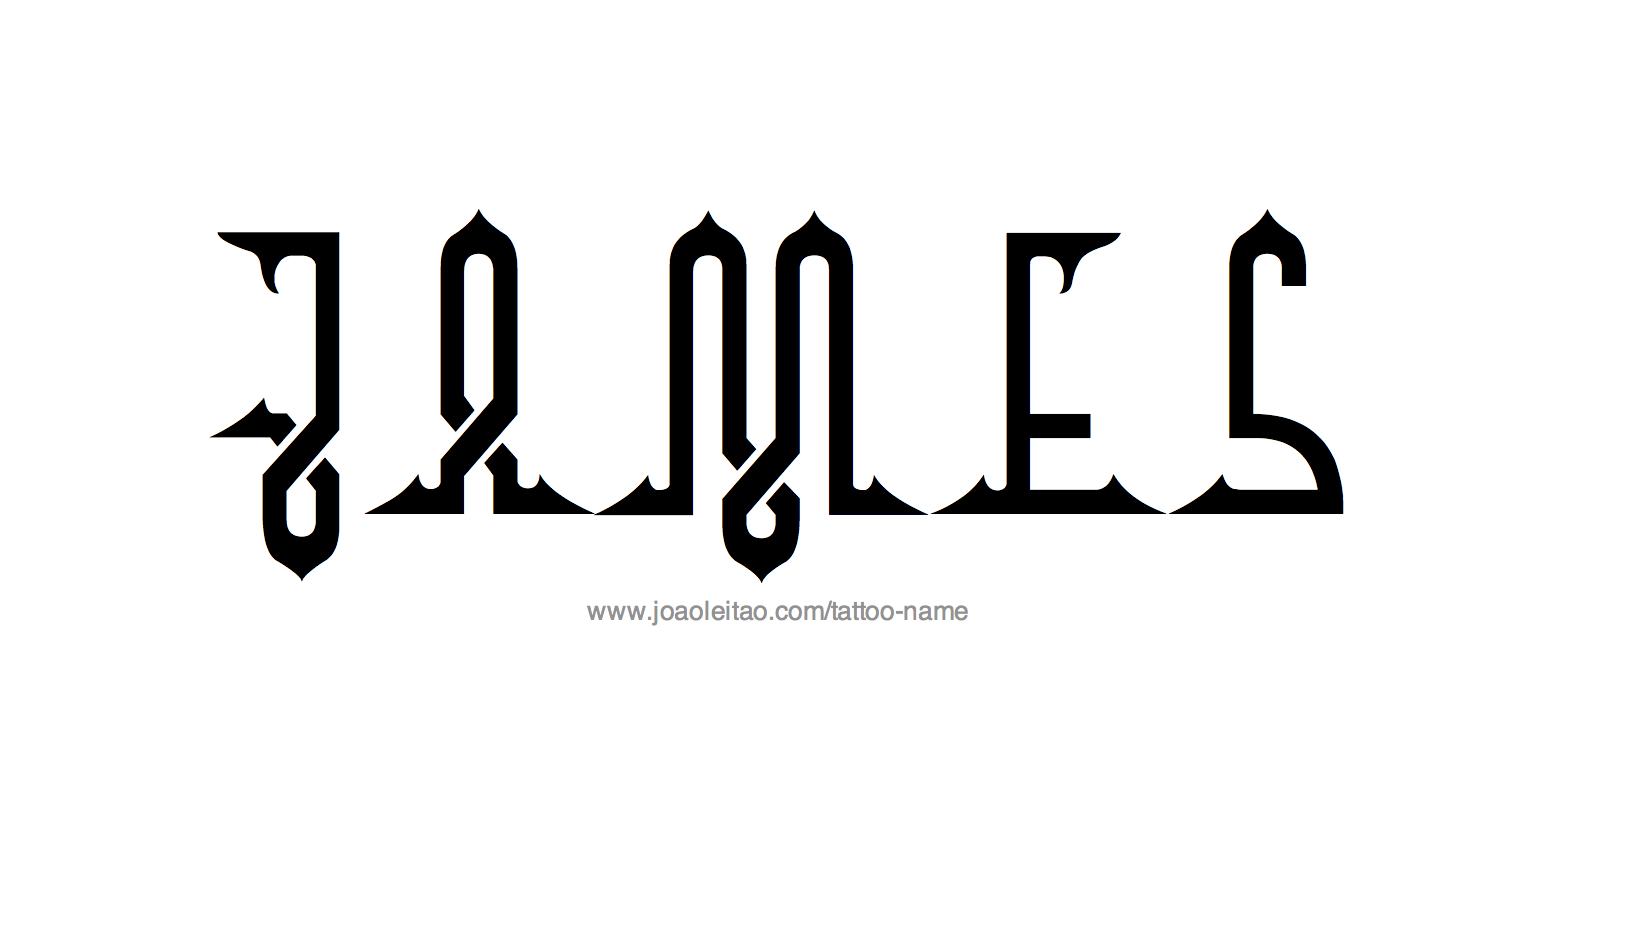 20 tattoo fonts marathi devanagari junglekey fr image 100 image maximal language jpg. Black Bedroom Furniture Sets. Home Design Ideas